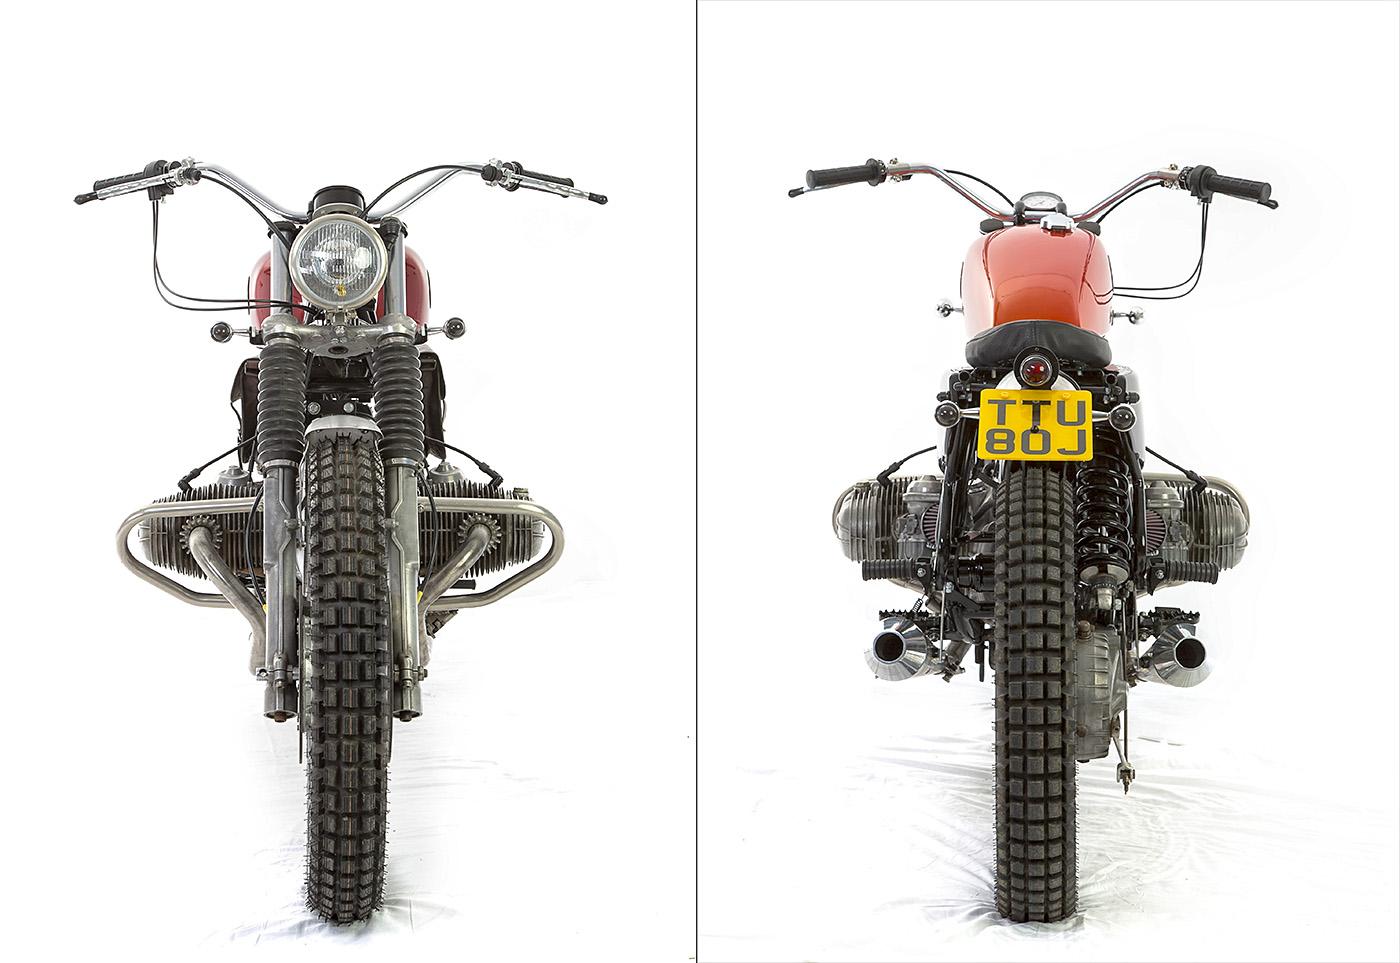 u03df hell kustom  u03df  bmw r80st 1984 by dust motorcycles